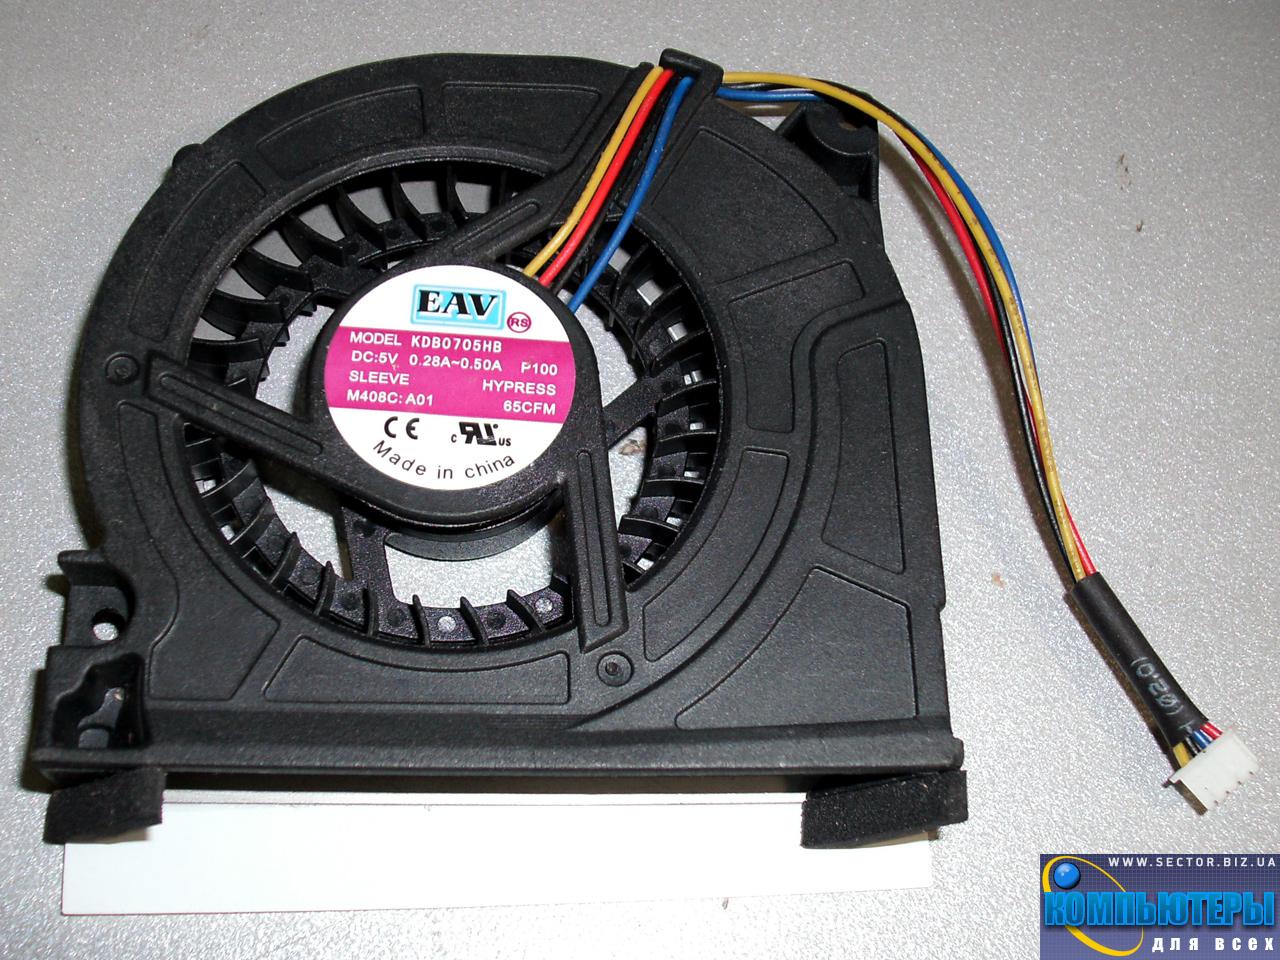 Кулер к ноутбуку Lenovo Y510 Y520 Y530 F51 p/n: KDB0705HB. Фото № 2.